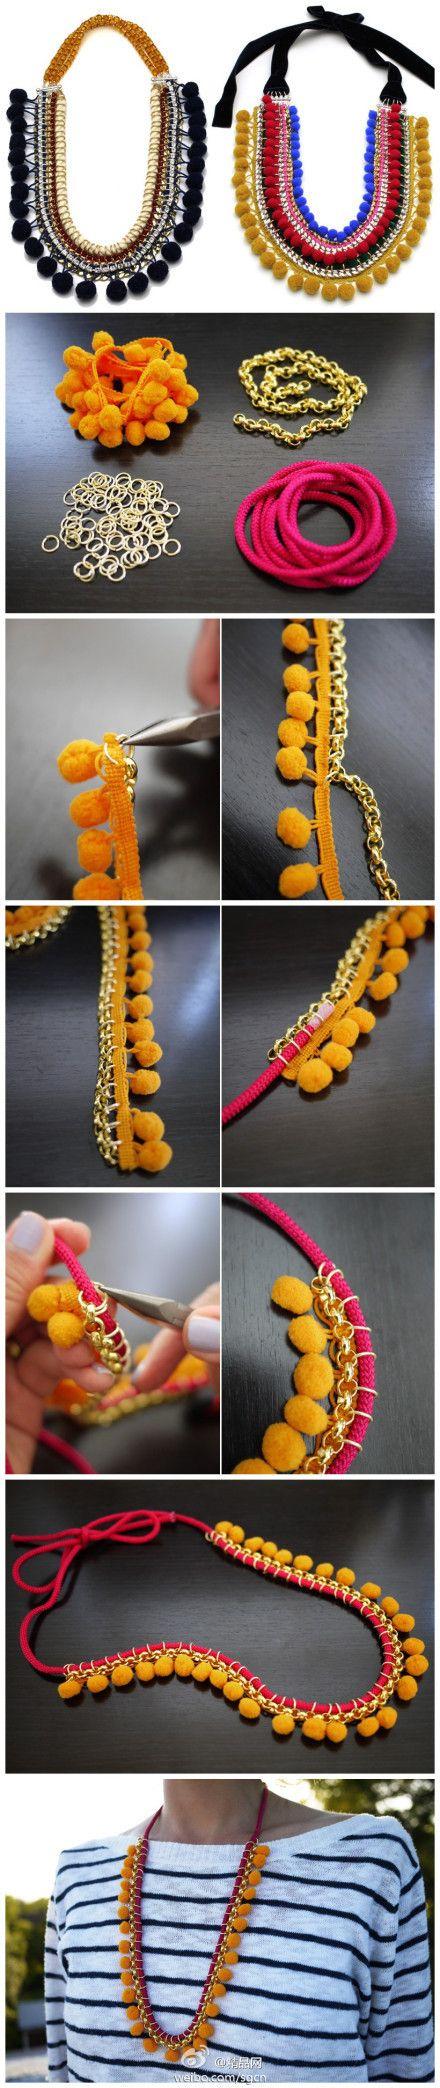 collier chaine pompom: